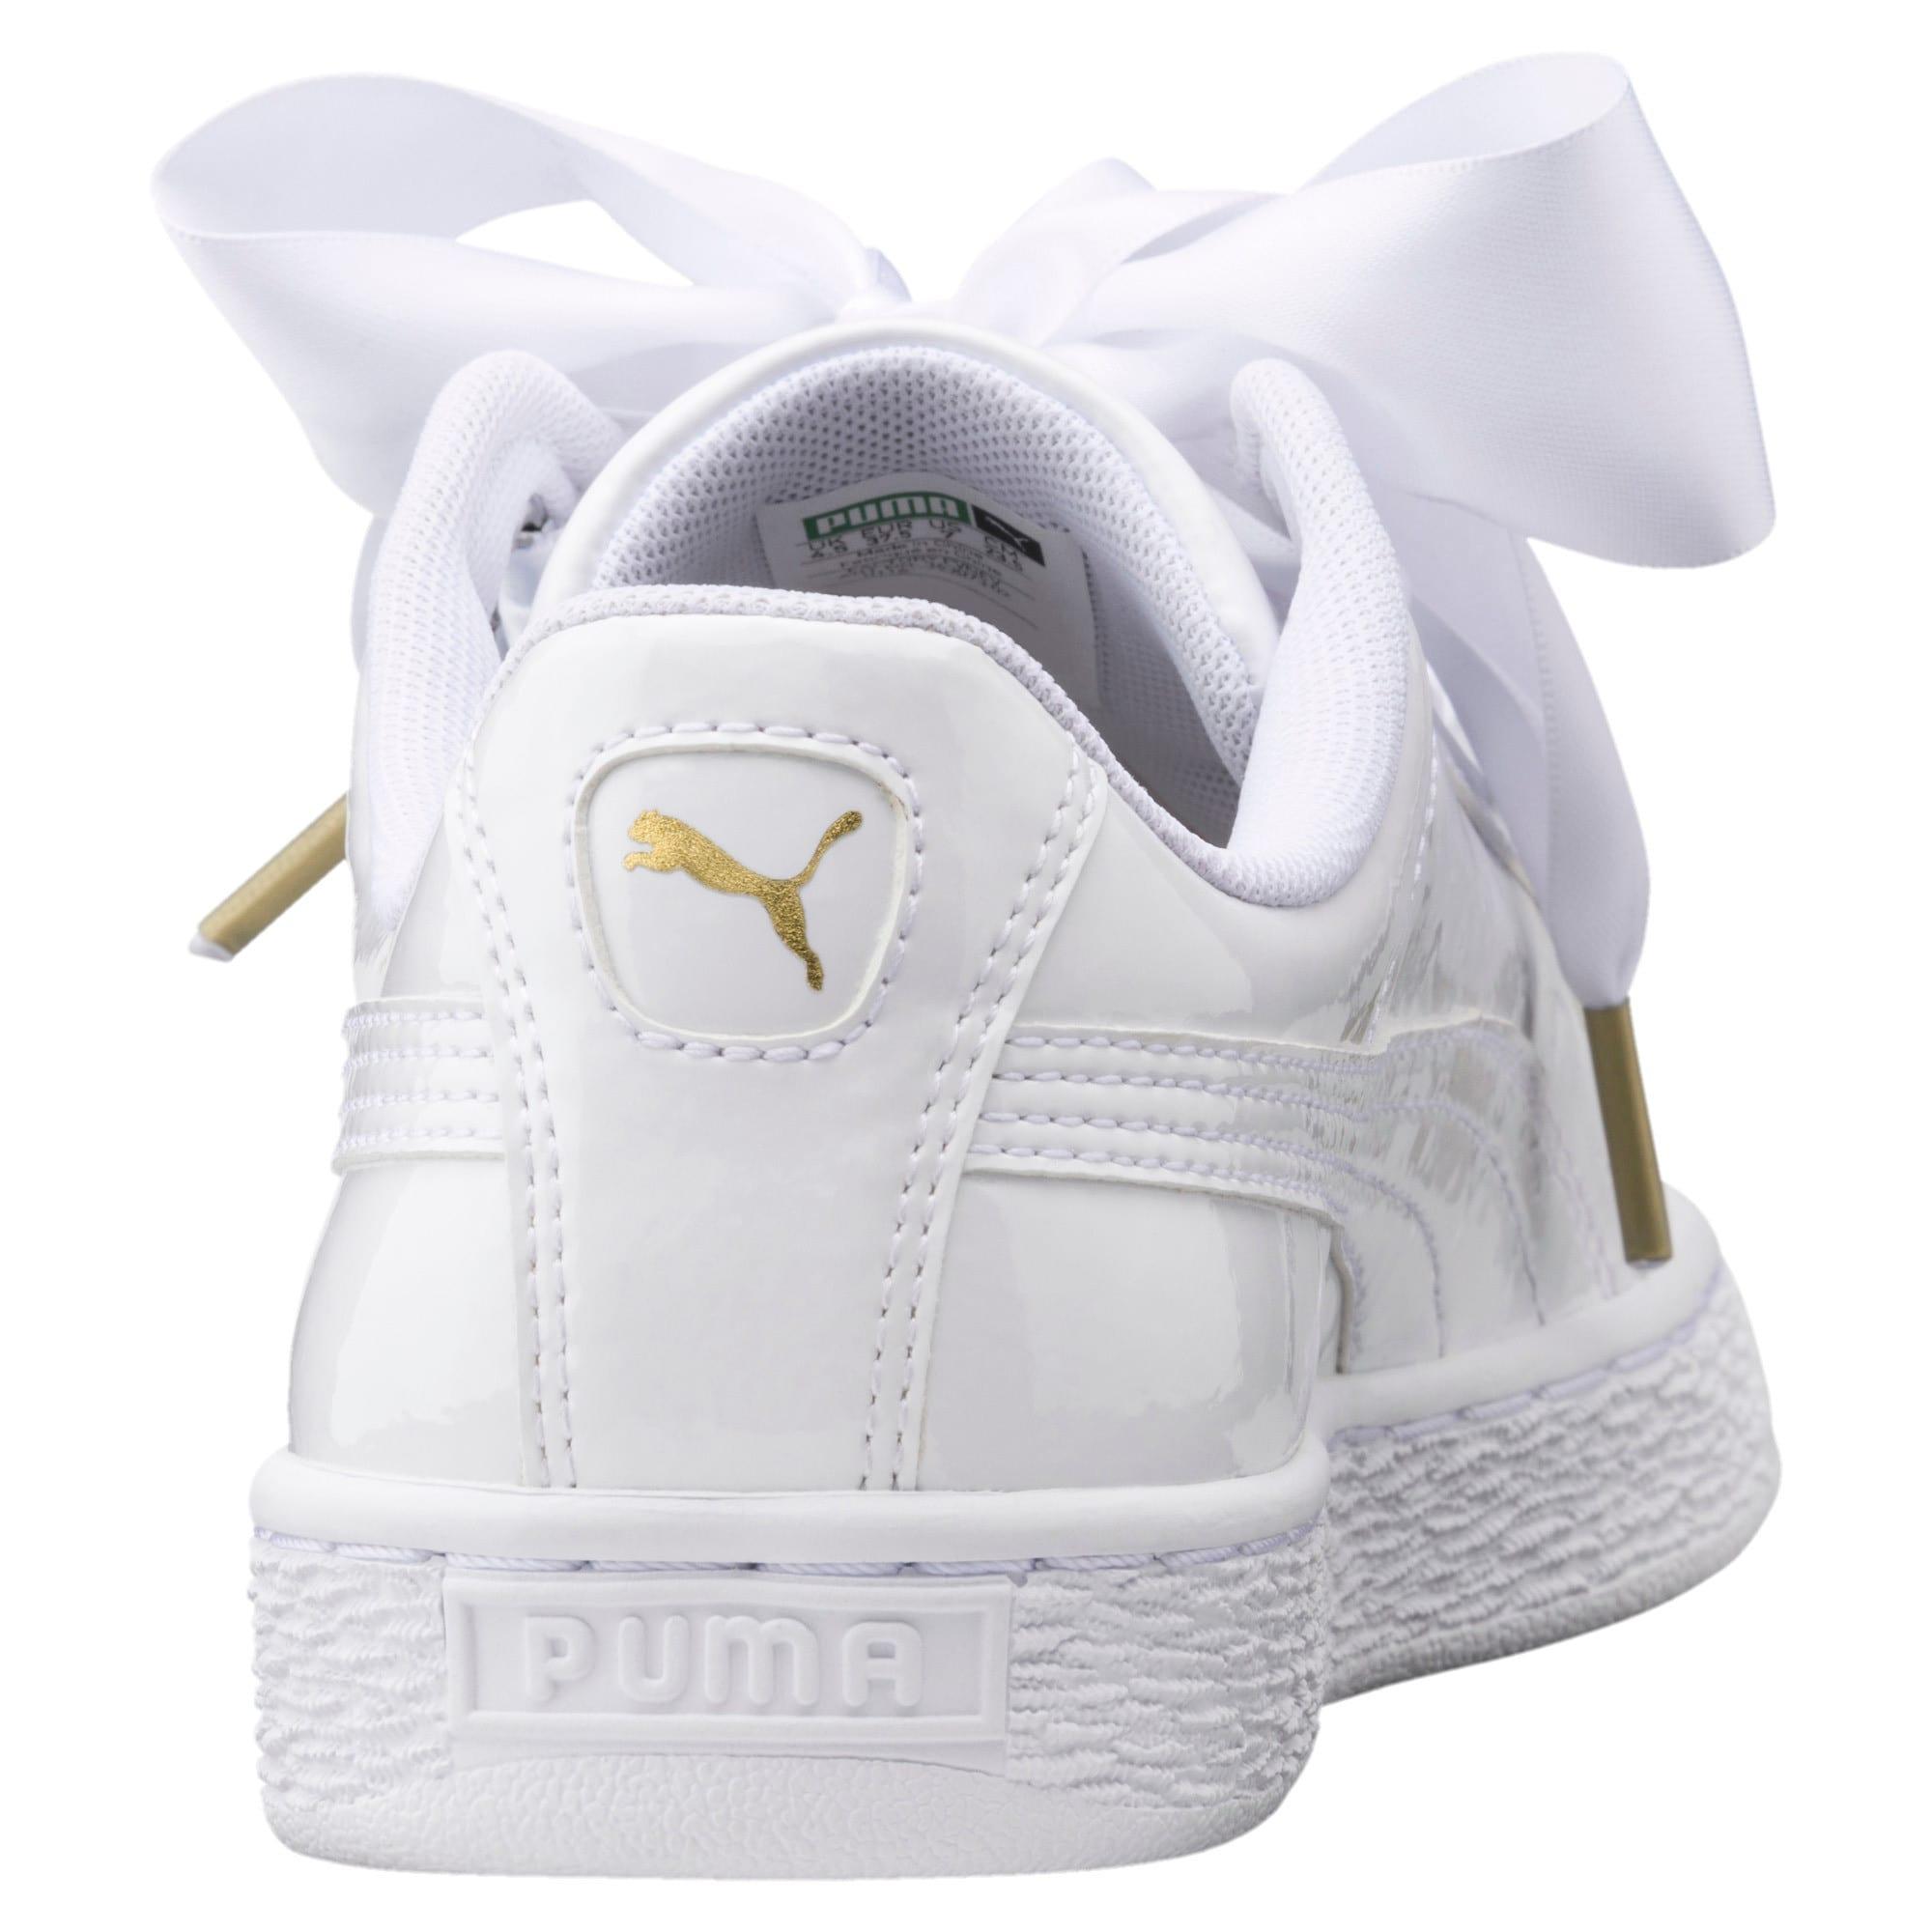 Thumbnail 3 of Basket Heart Patent Women's Trainers, Puma White-Puma White, medium